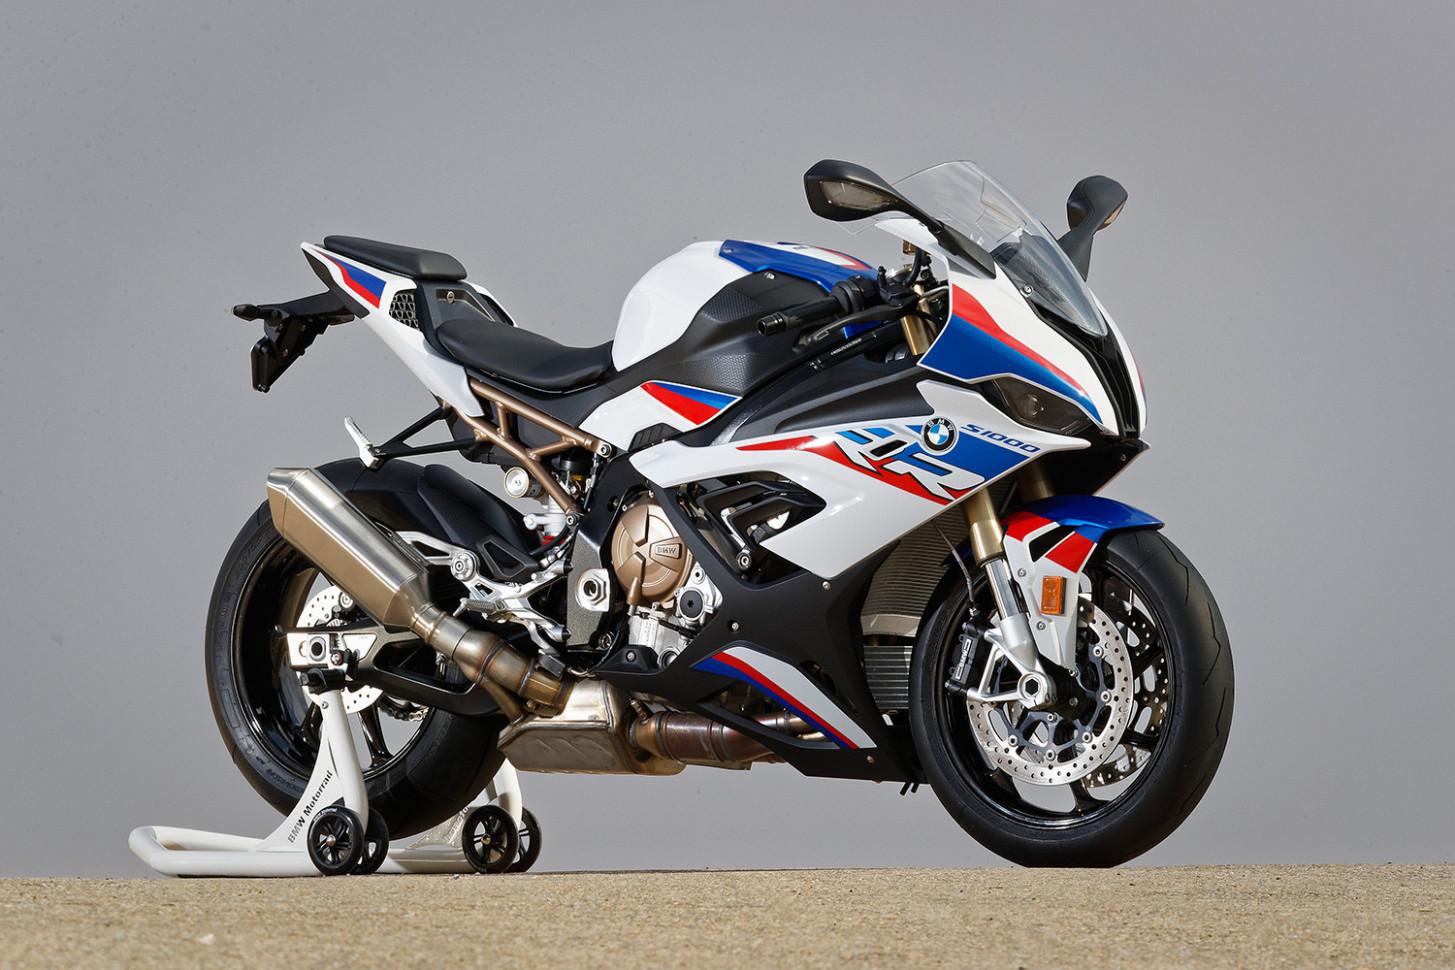 Concept BMW S1000Rr 2022 Price